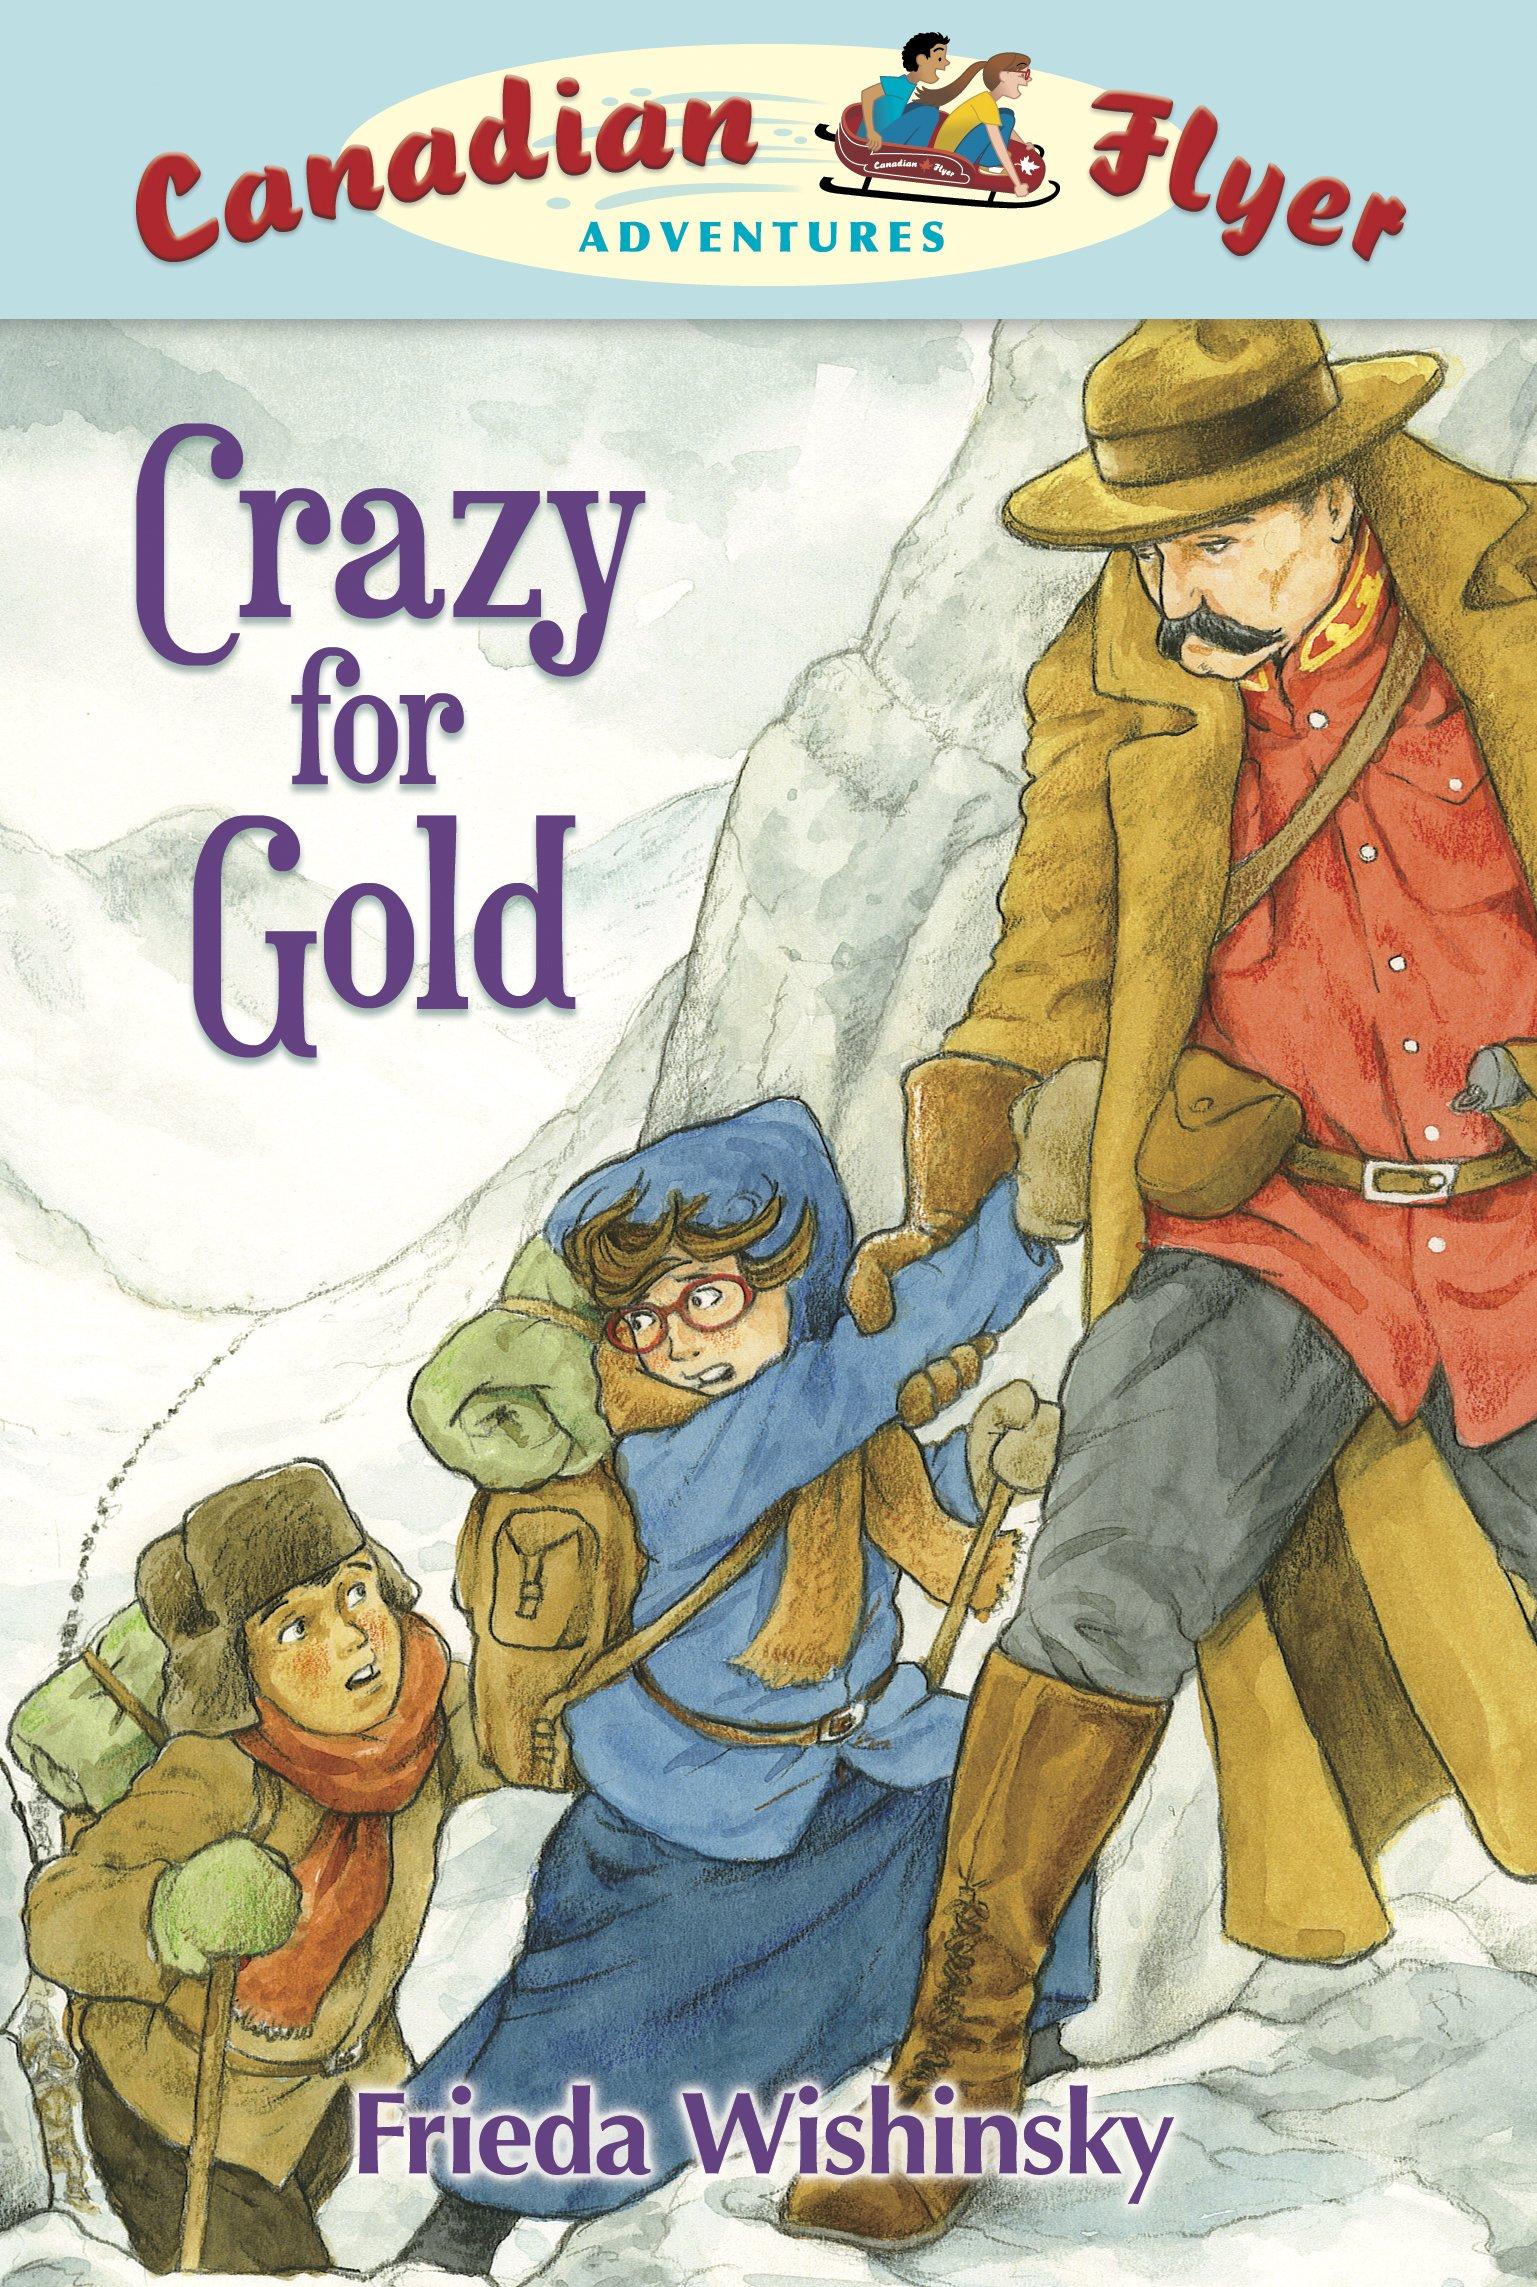 Download Canadian Flyer Adventures #3: Crazy for Gold pdf epub